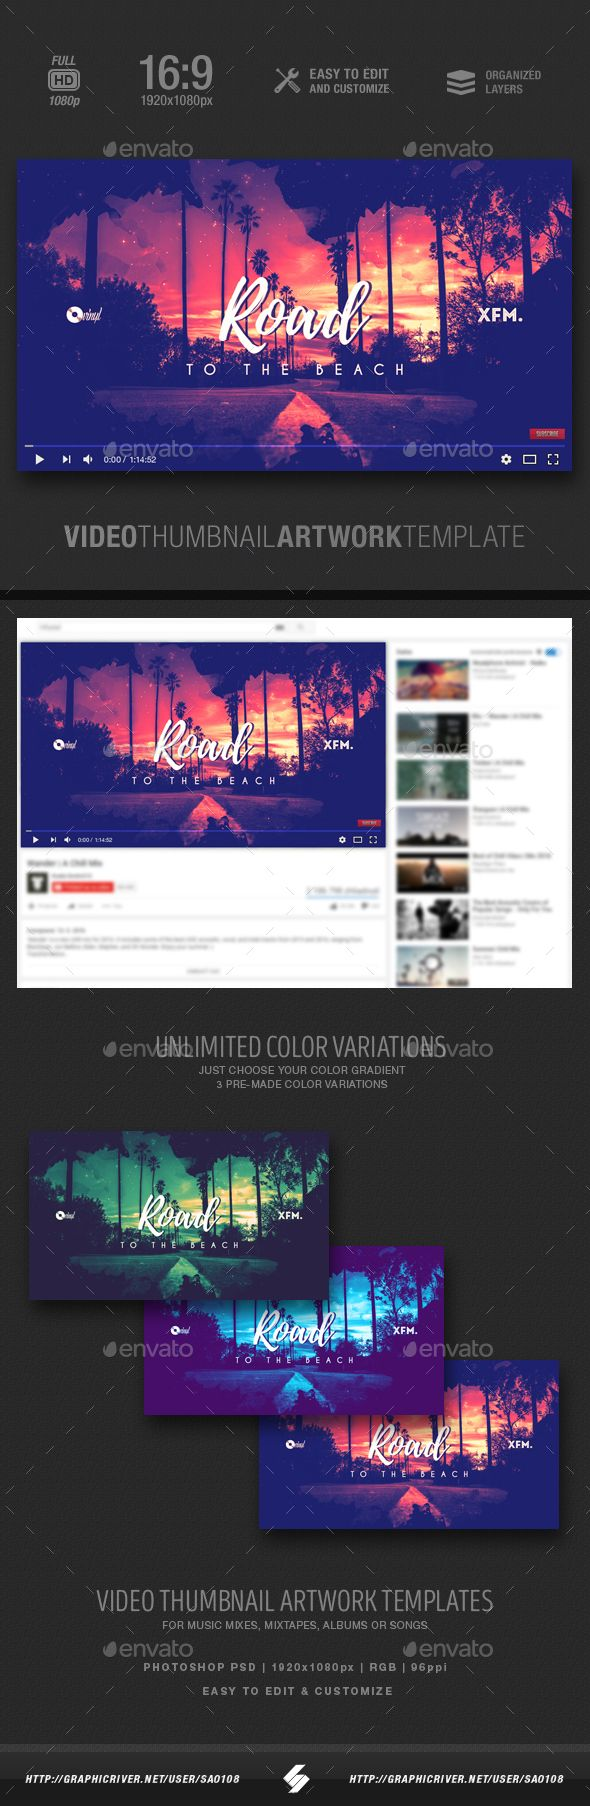 Youtube house music video thumbnail artwork template Music mix